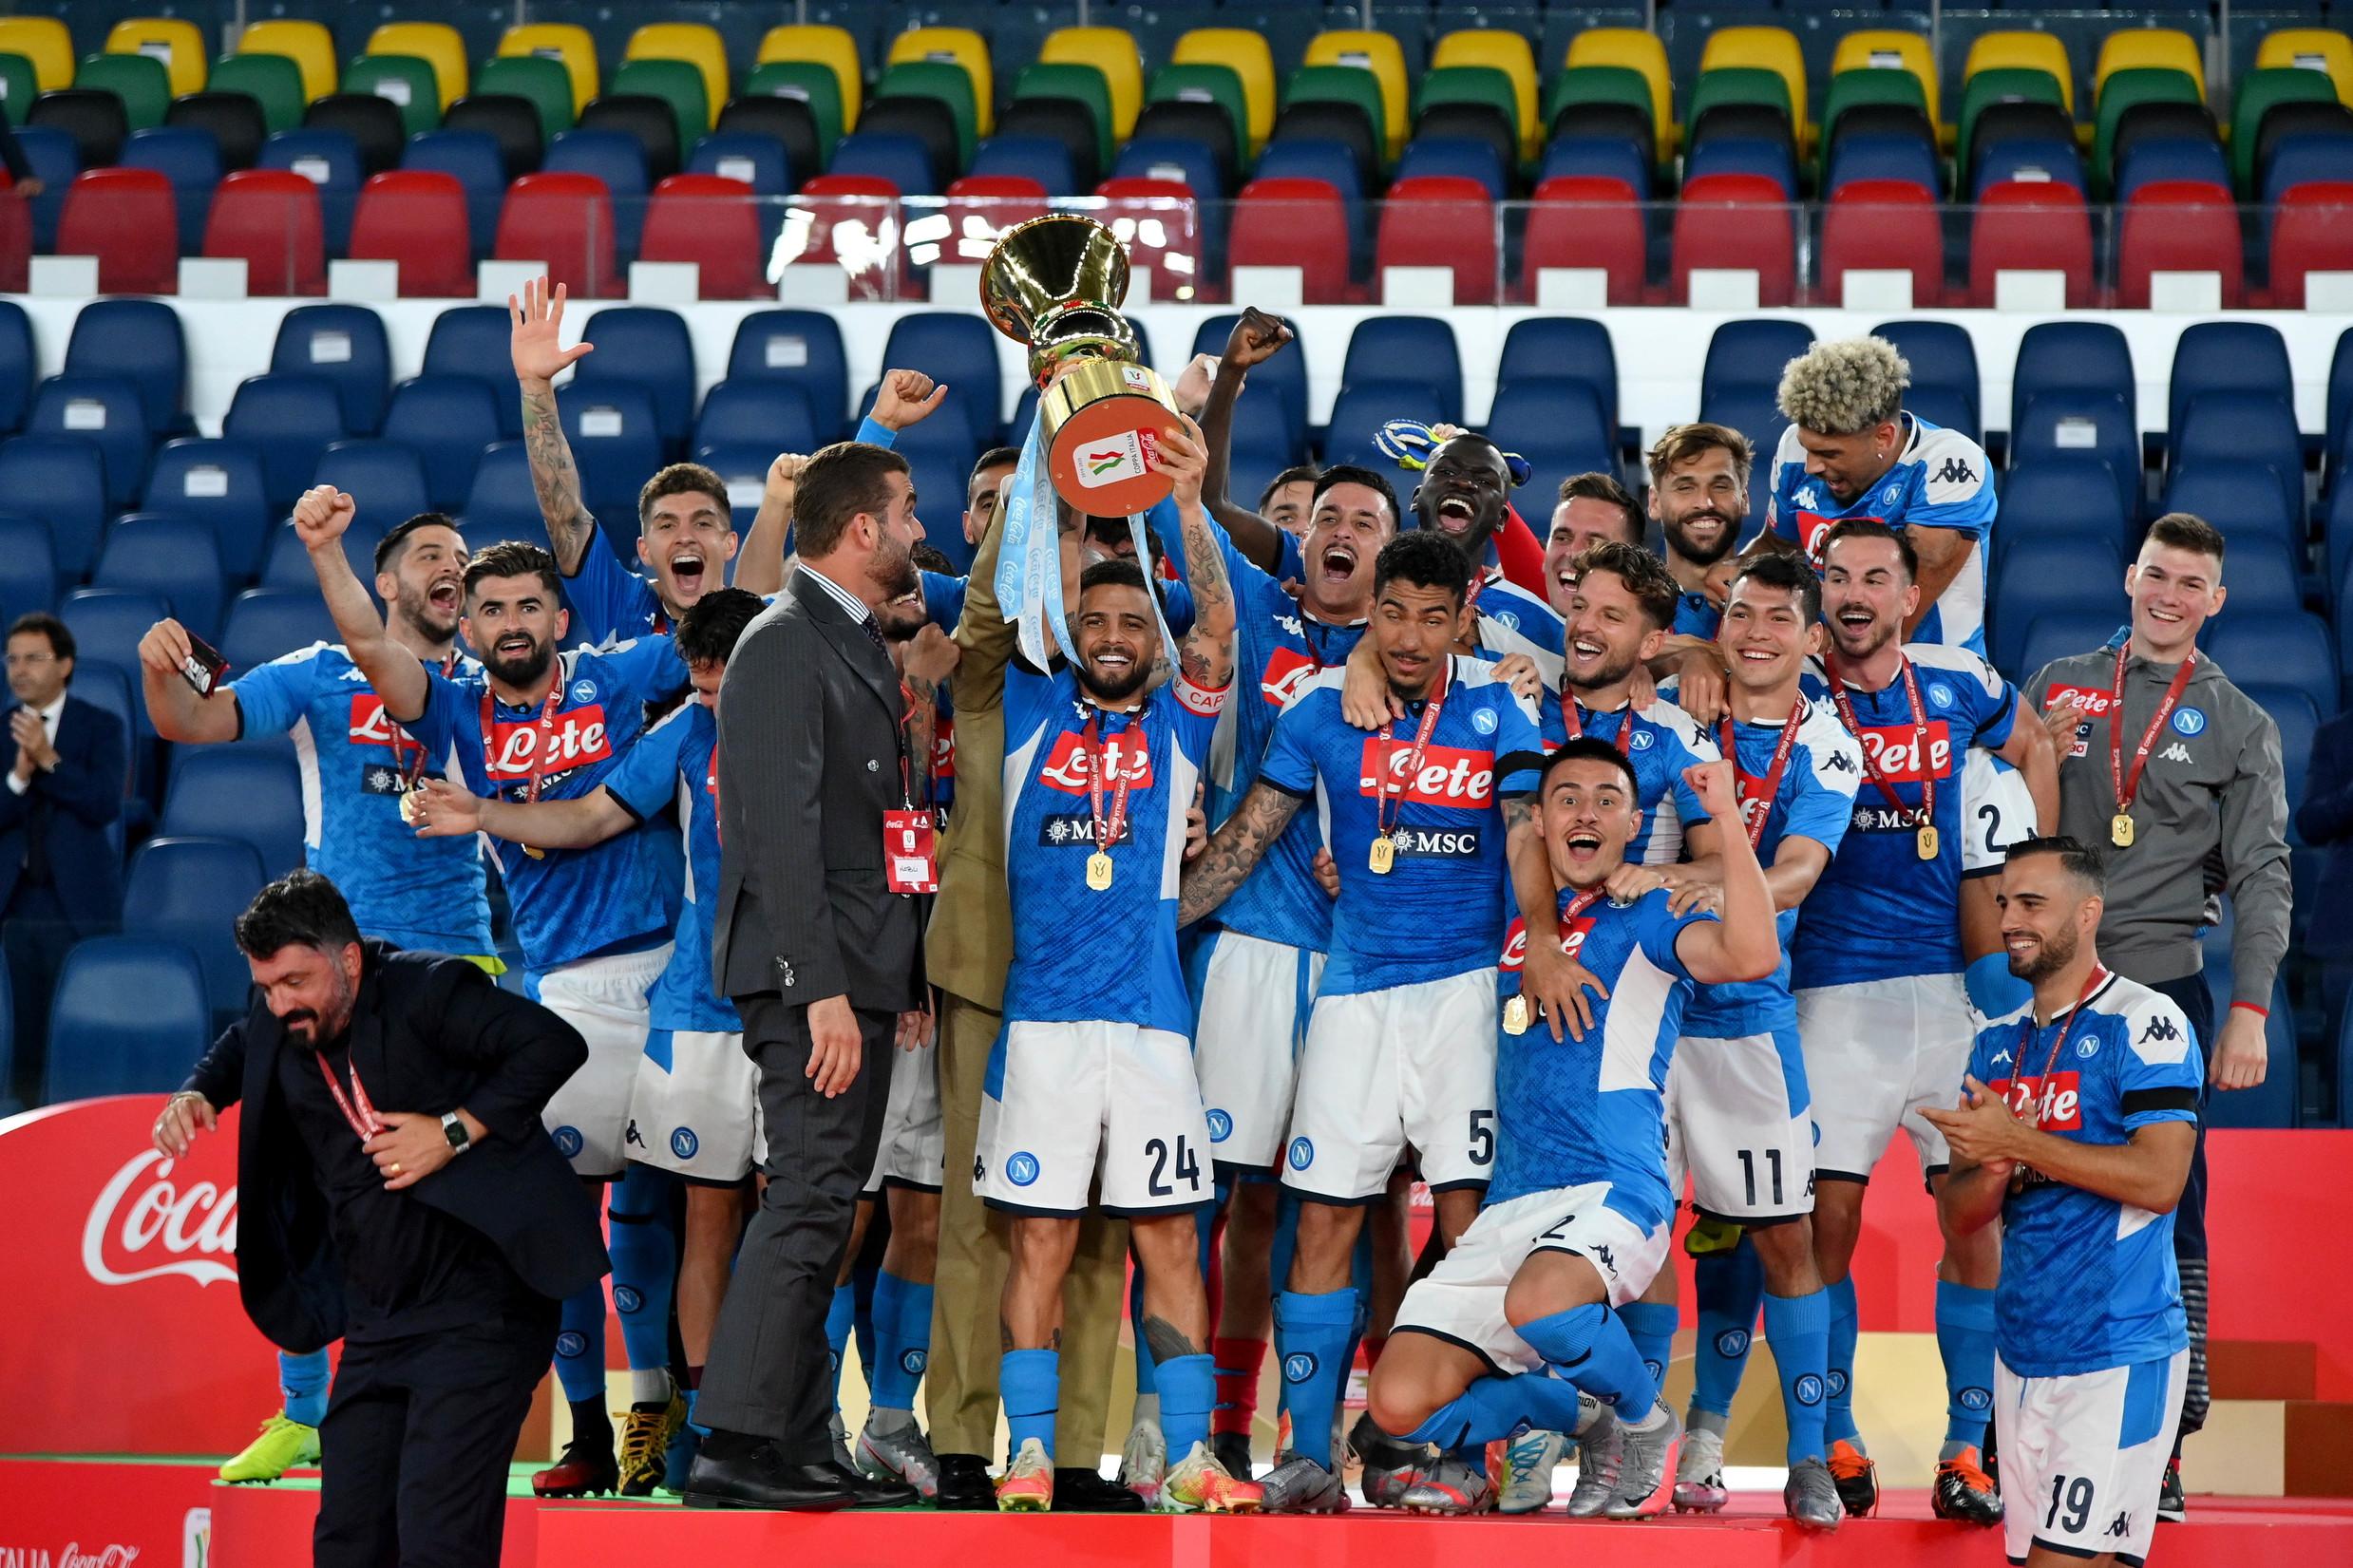 Napoli, 2019/20.